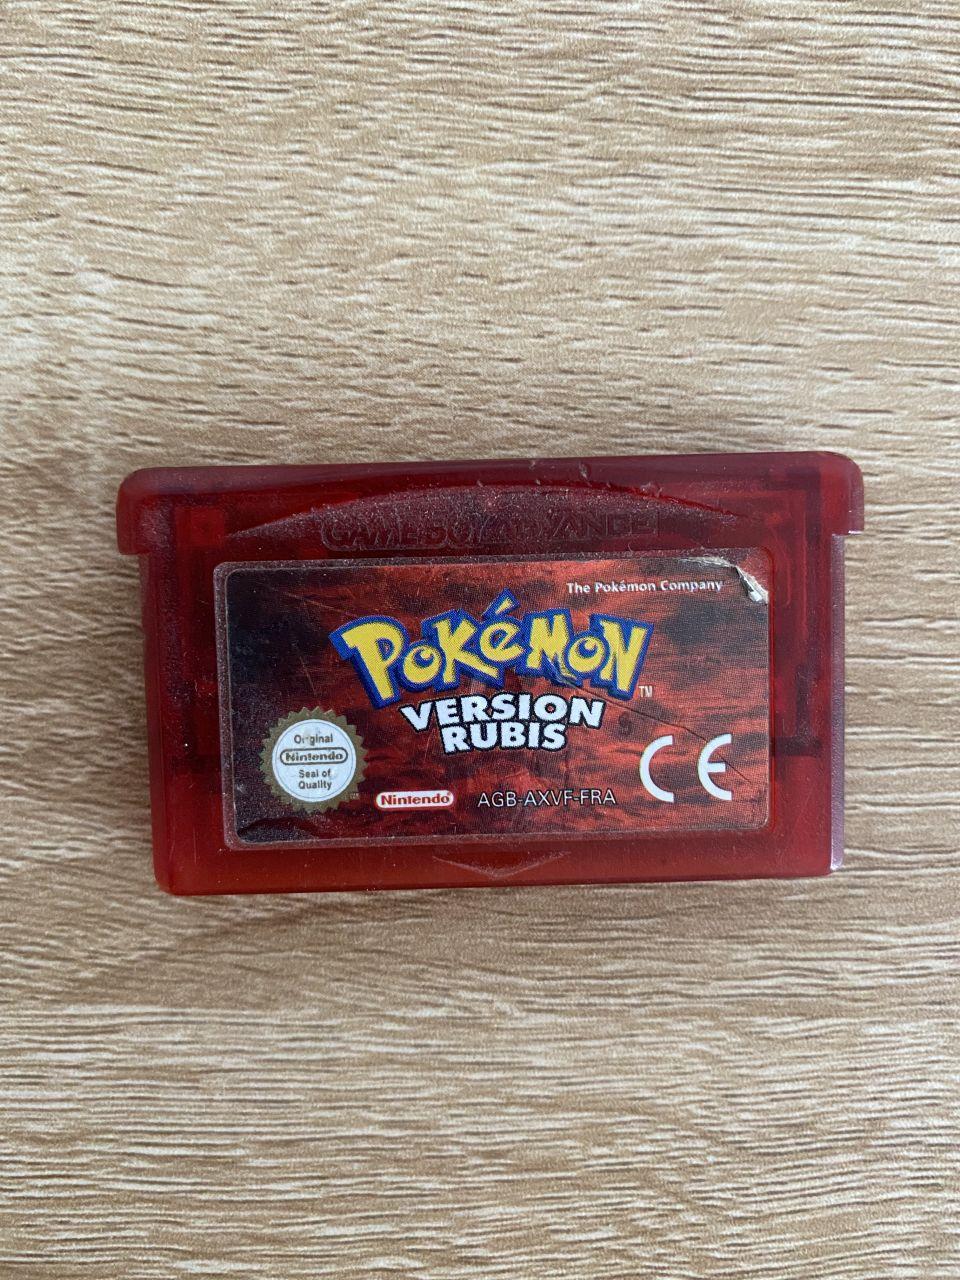 Image article Pokémon Version Rubis